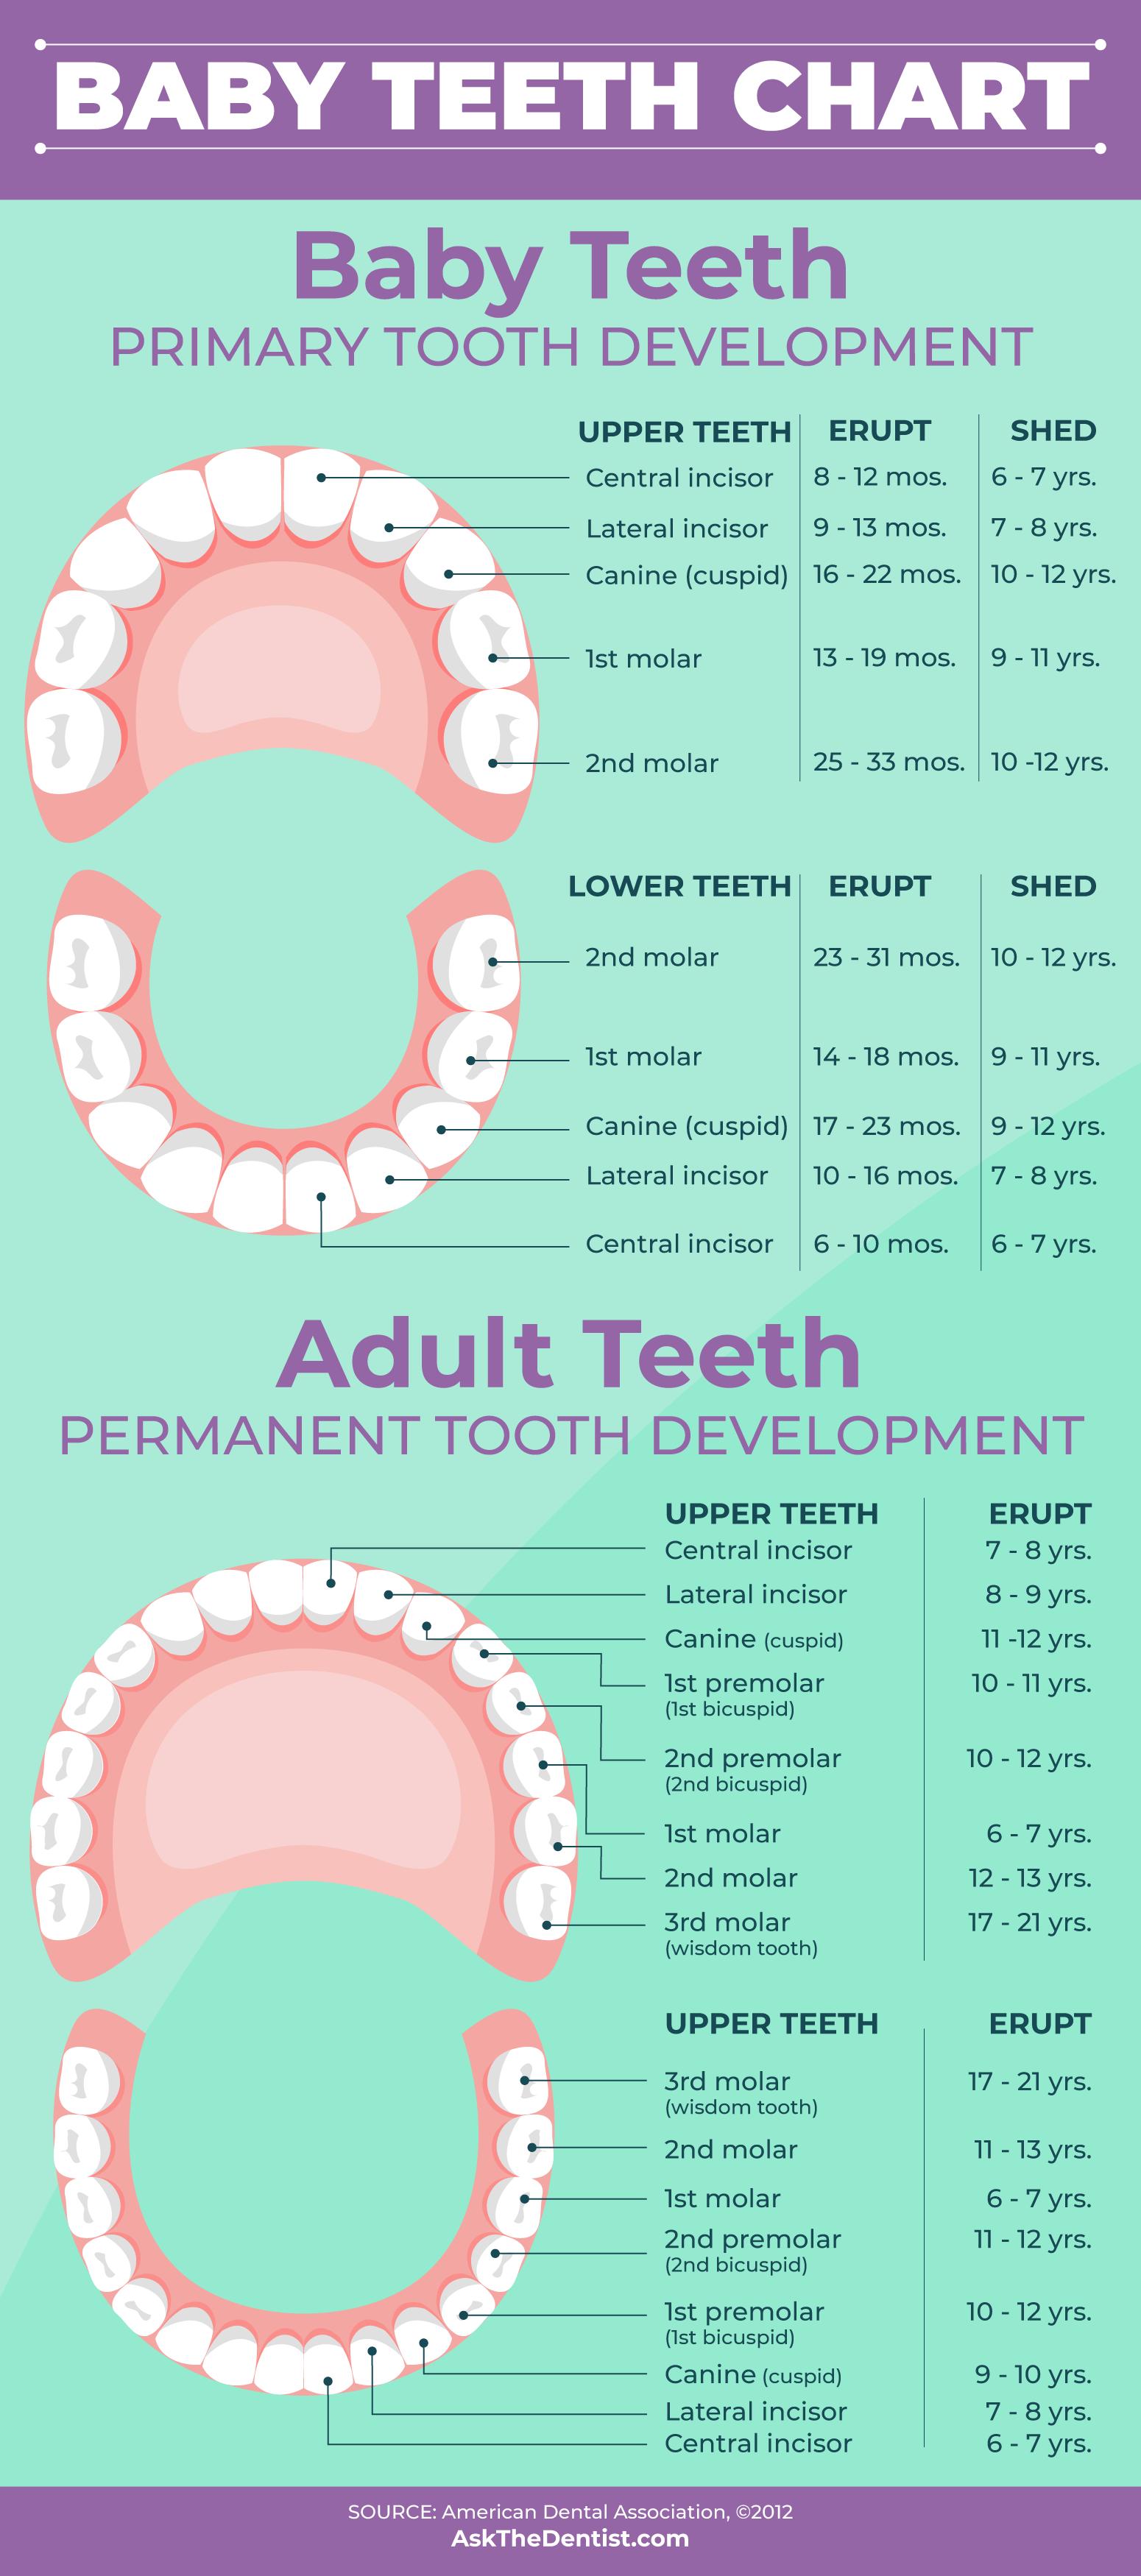 Tooth development chart